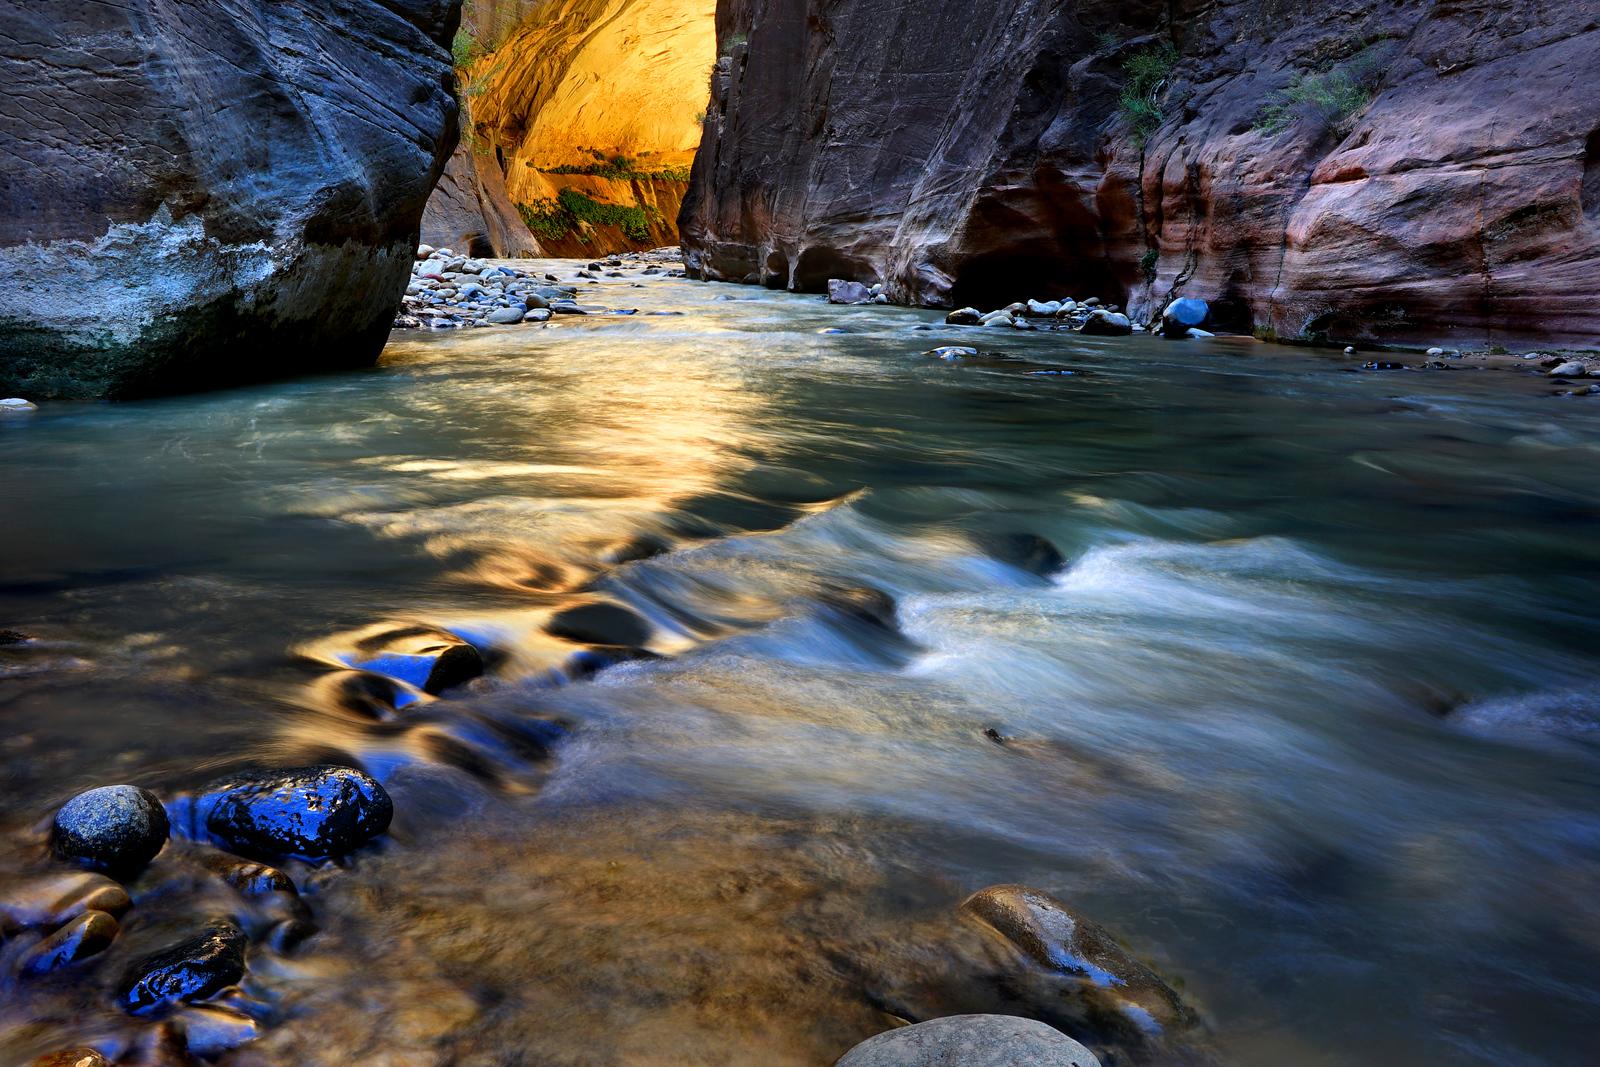 Canyon Exposure